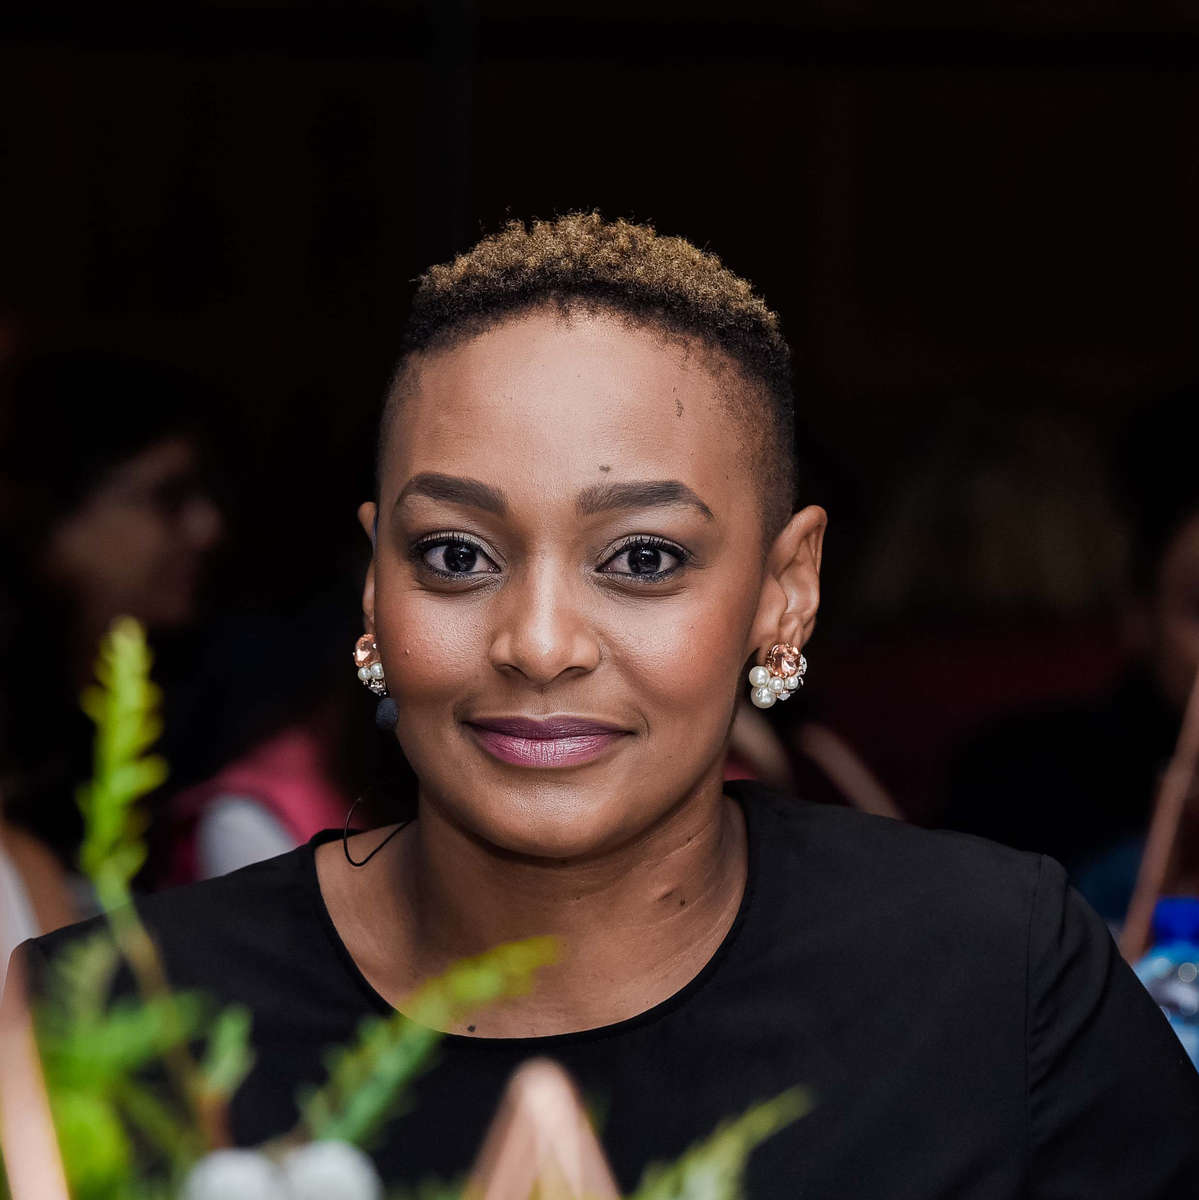 Gugulethu Mfuphi